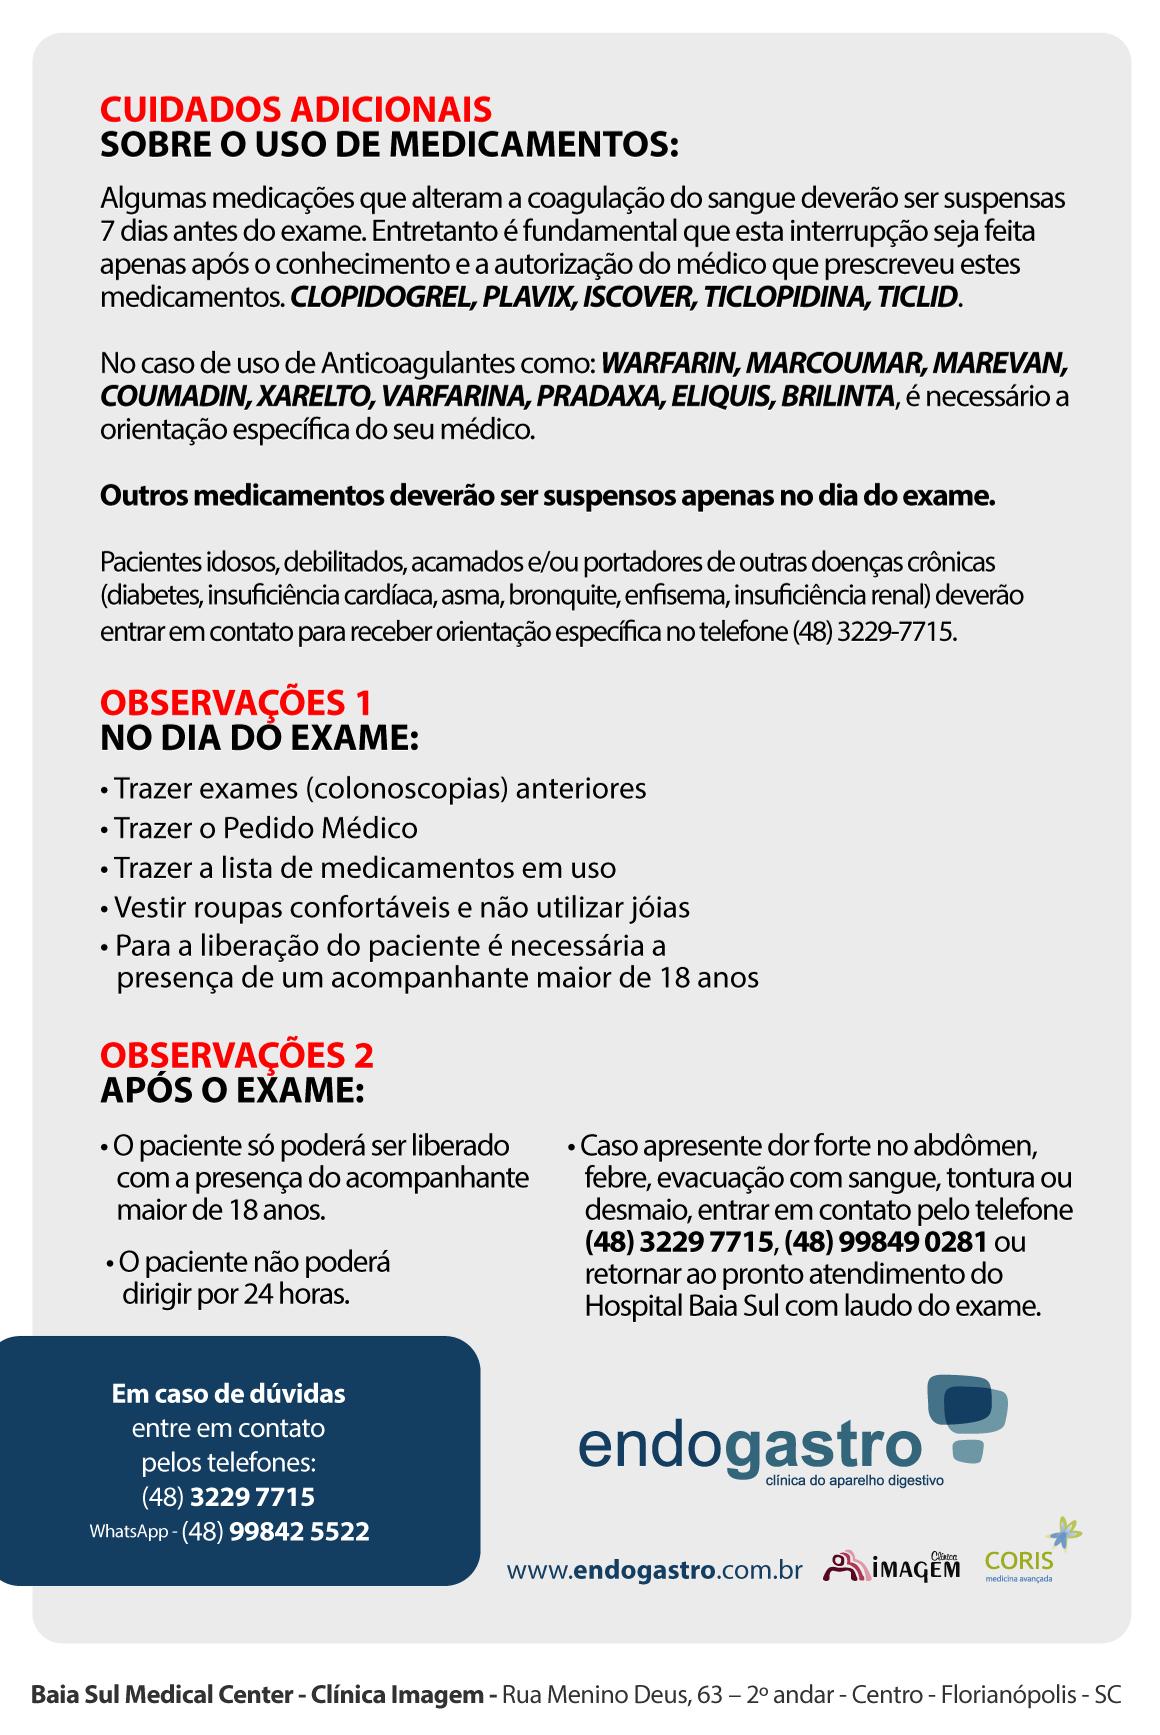 http://endogastro.com.br/wp-content/uploads/2020/08/END_002_16-AF_Folheto_Colonoscopia-2020_v3_web_04.png